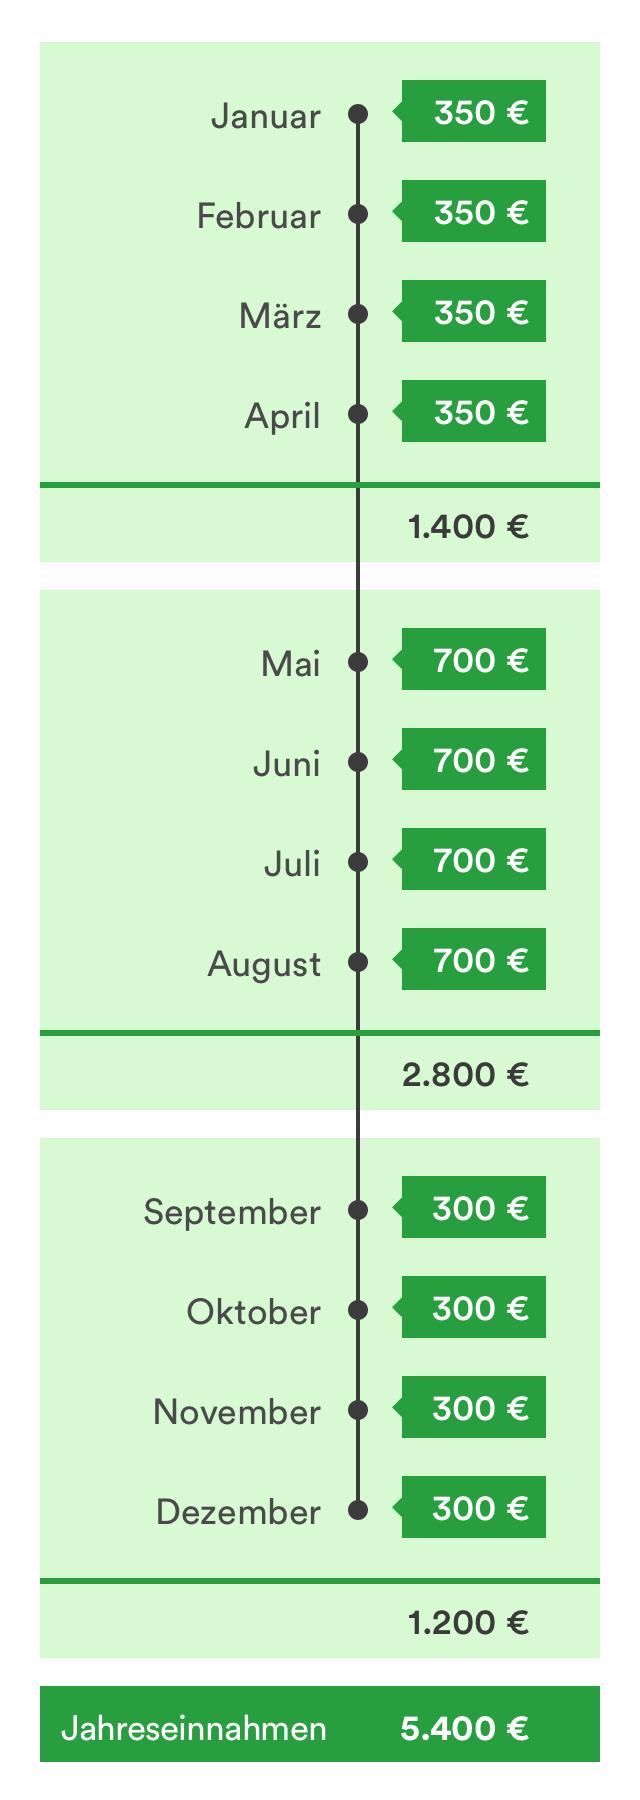 Minijob Jahreseinnahmen